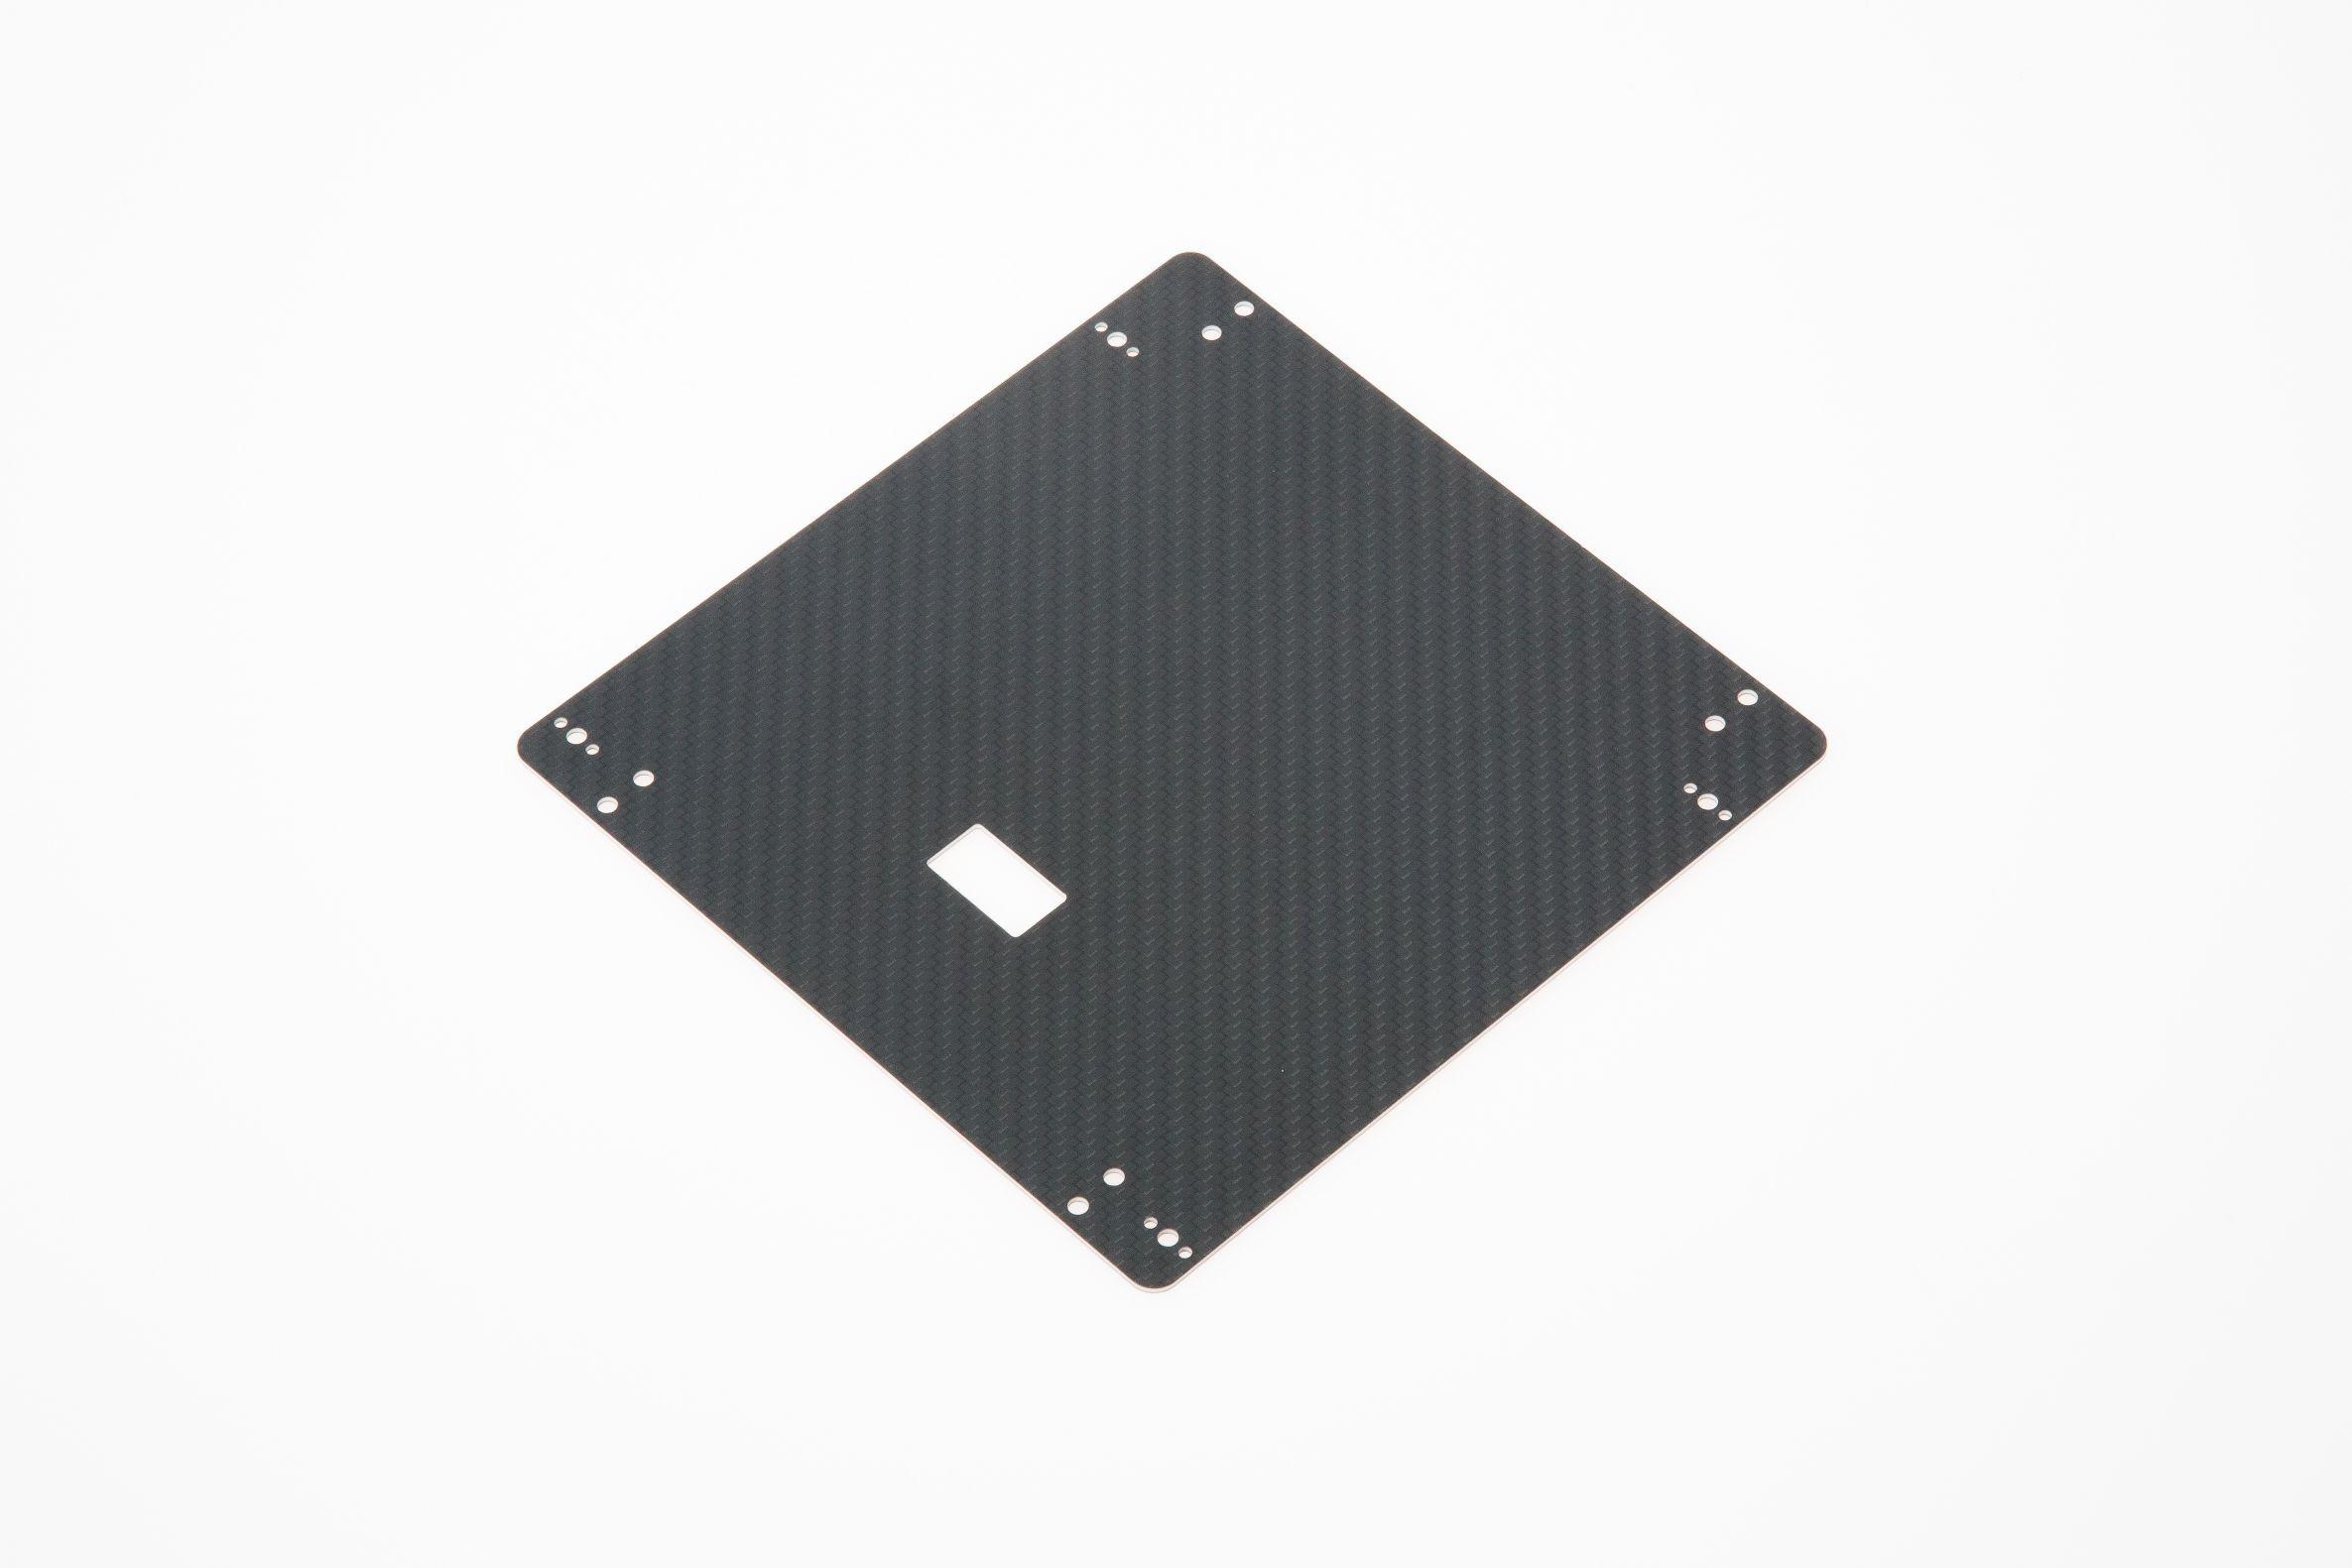 DJI Matrice 600 / Matrice 600 pro Bottom Expansion Board V2